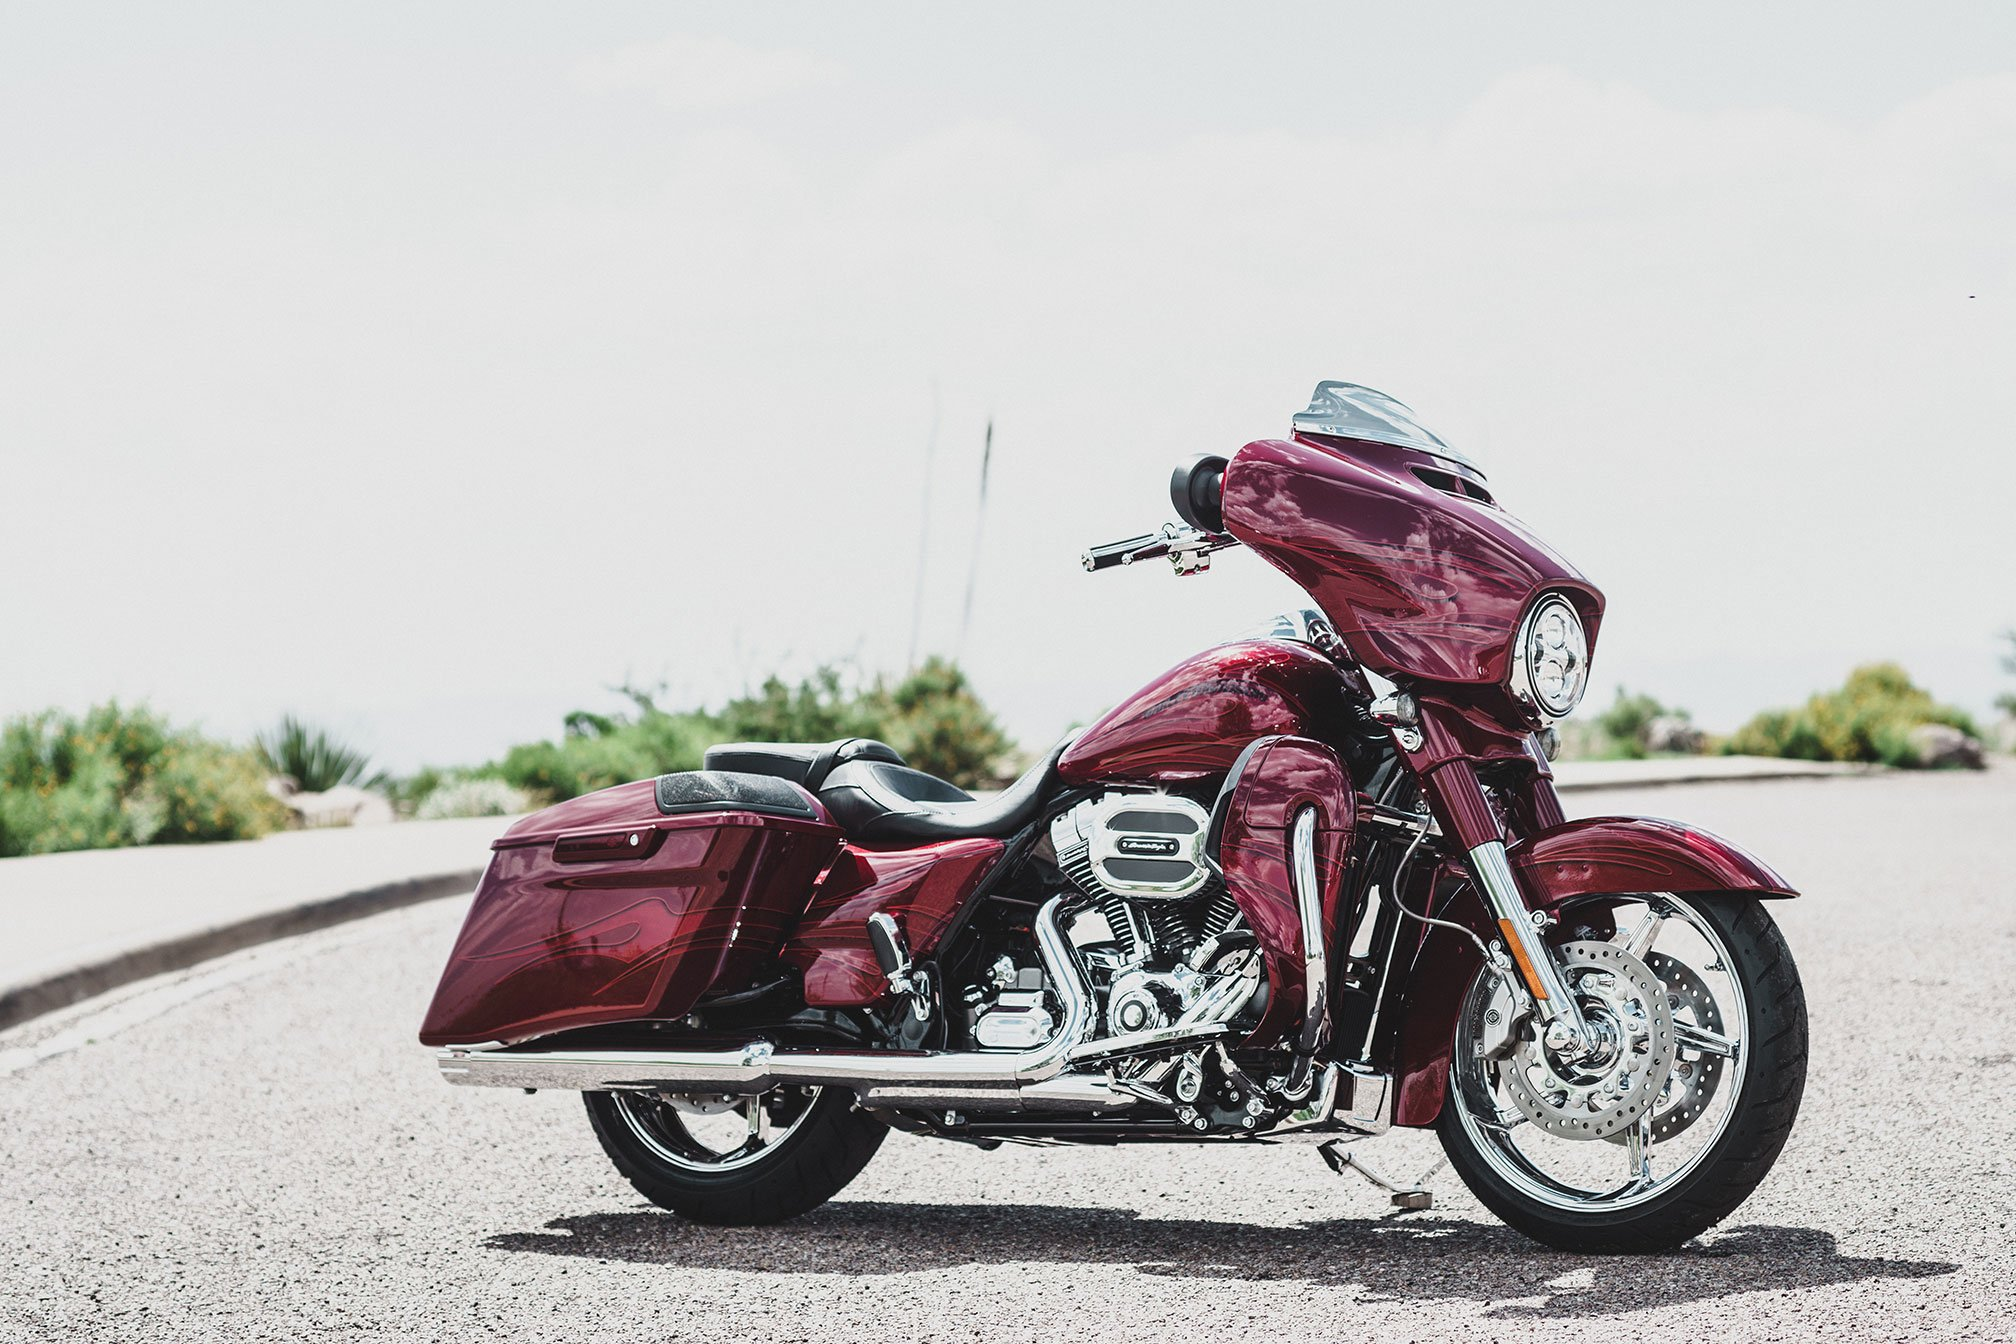 motorcycle harley street glide wallpaper - photo #3